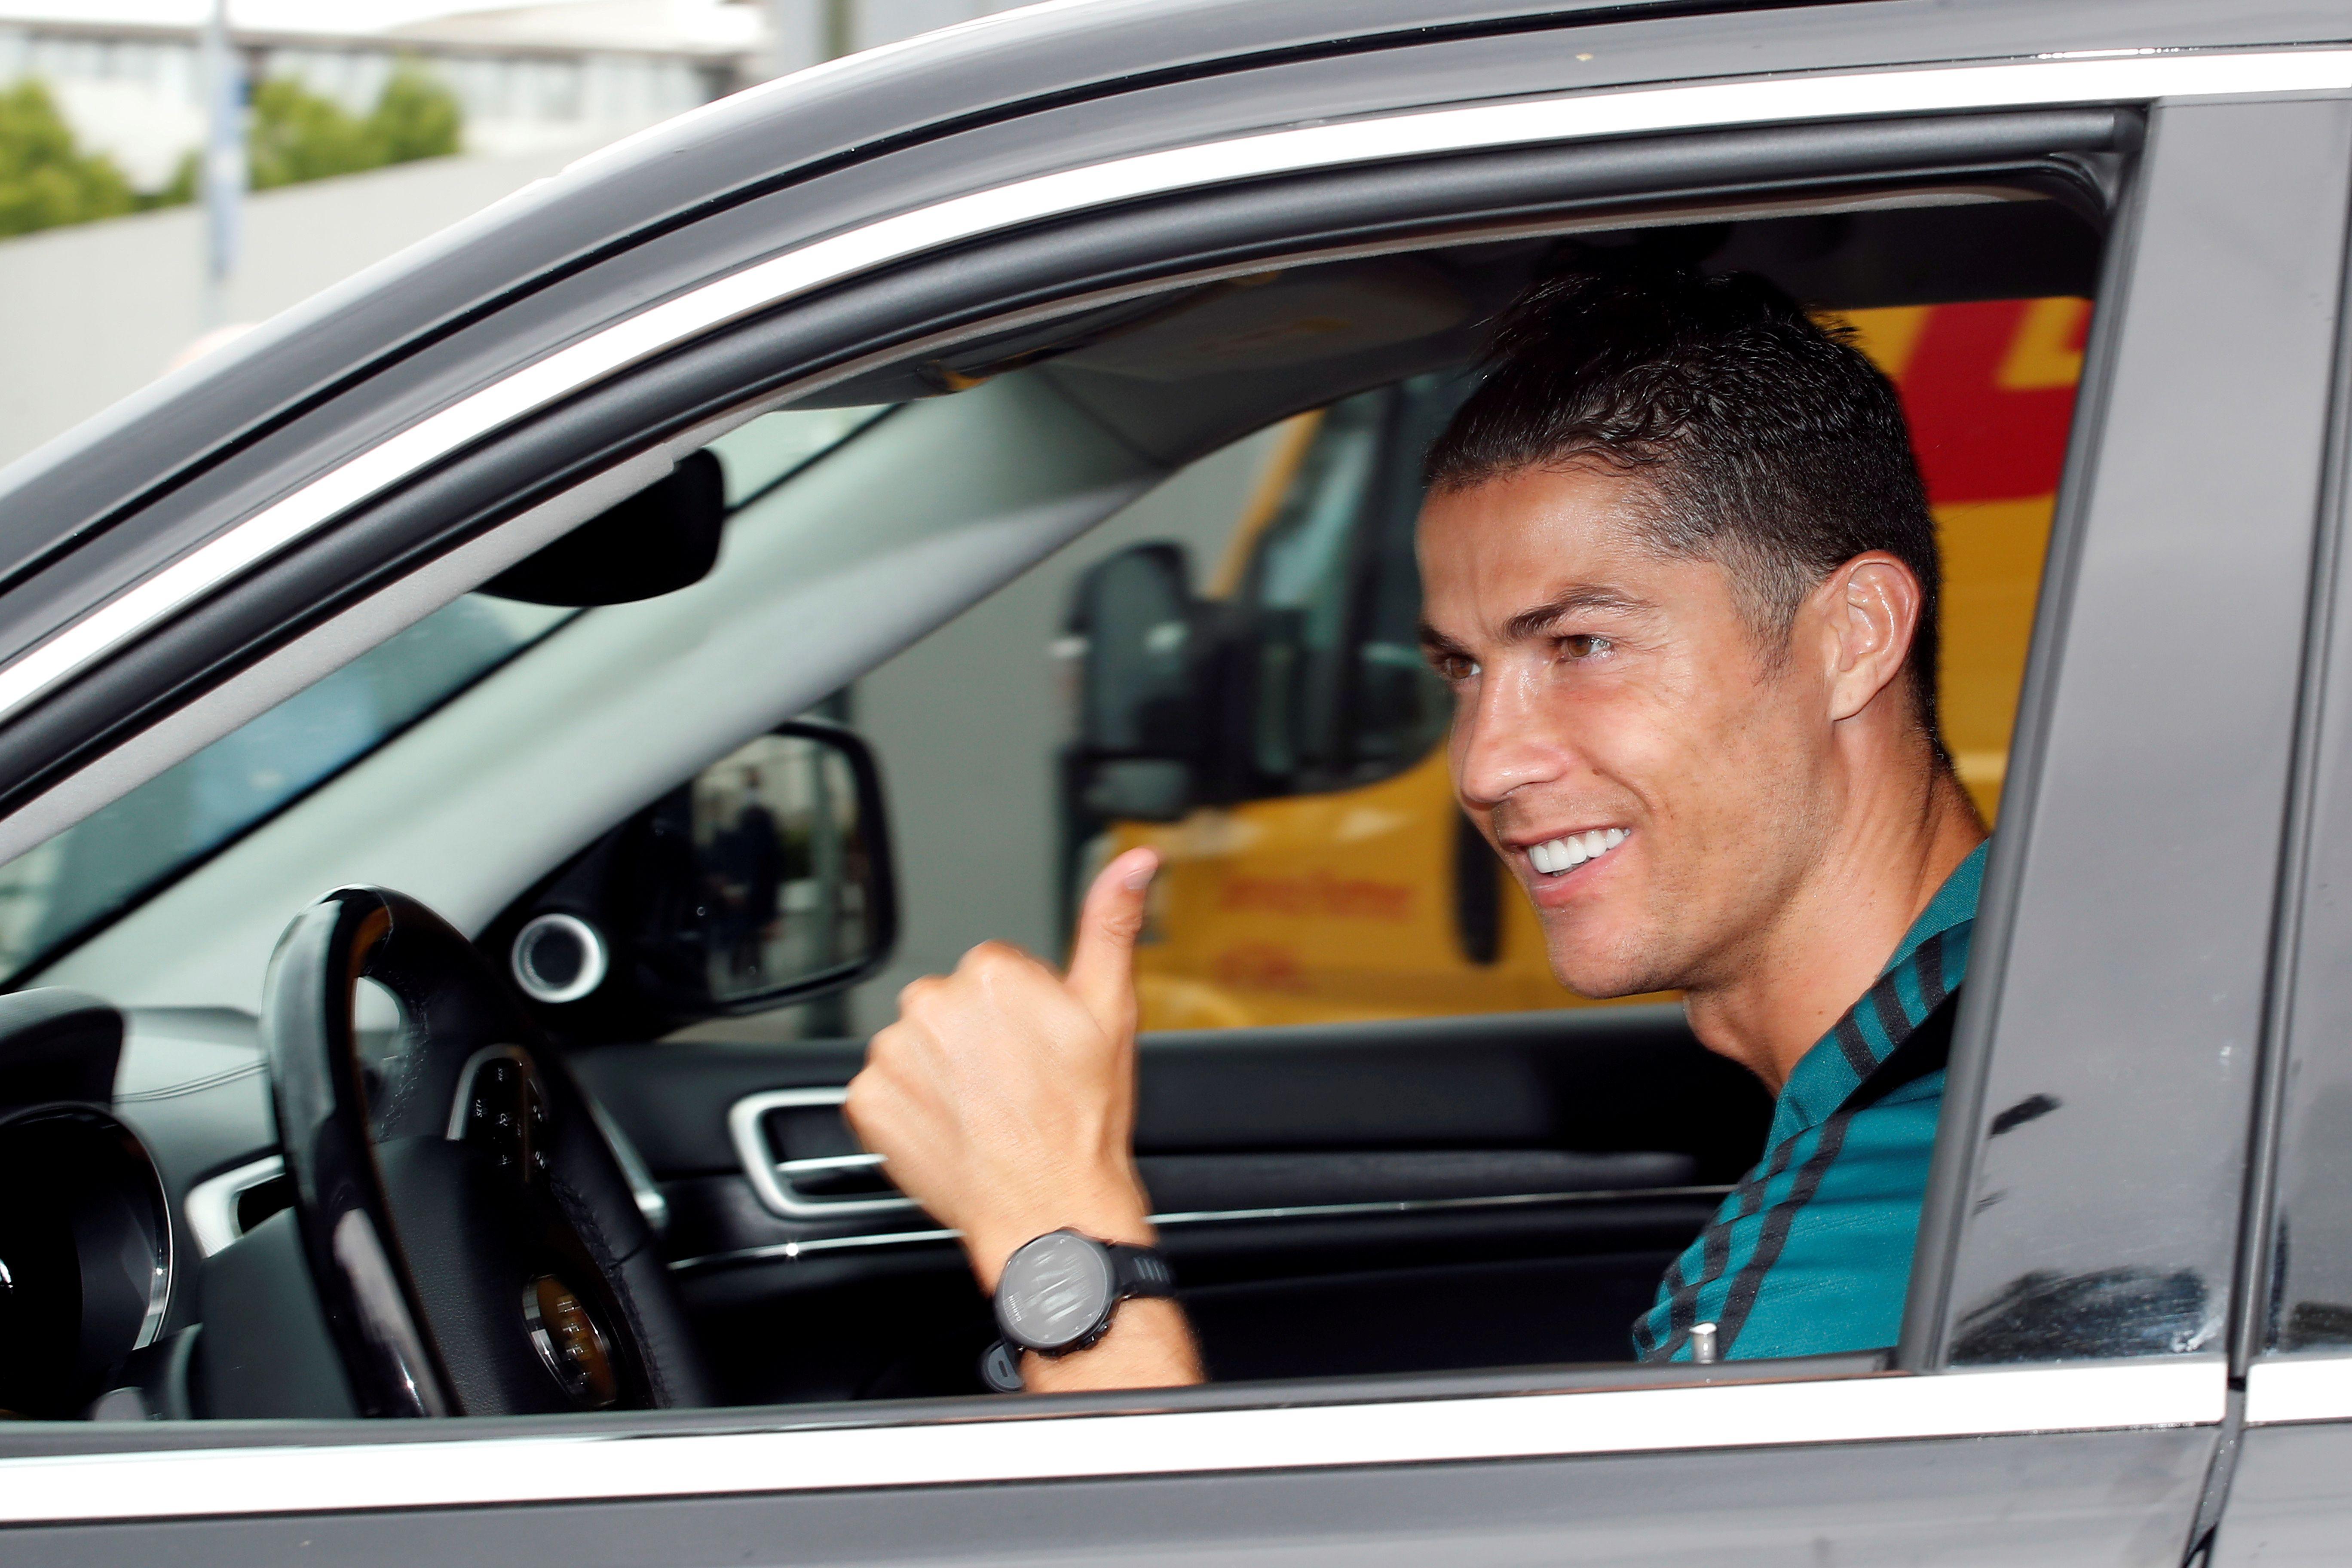 Football - Etranger - Sorti de quarantaine, revoilà Ronaldo